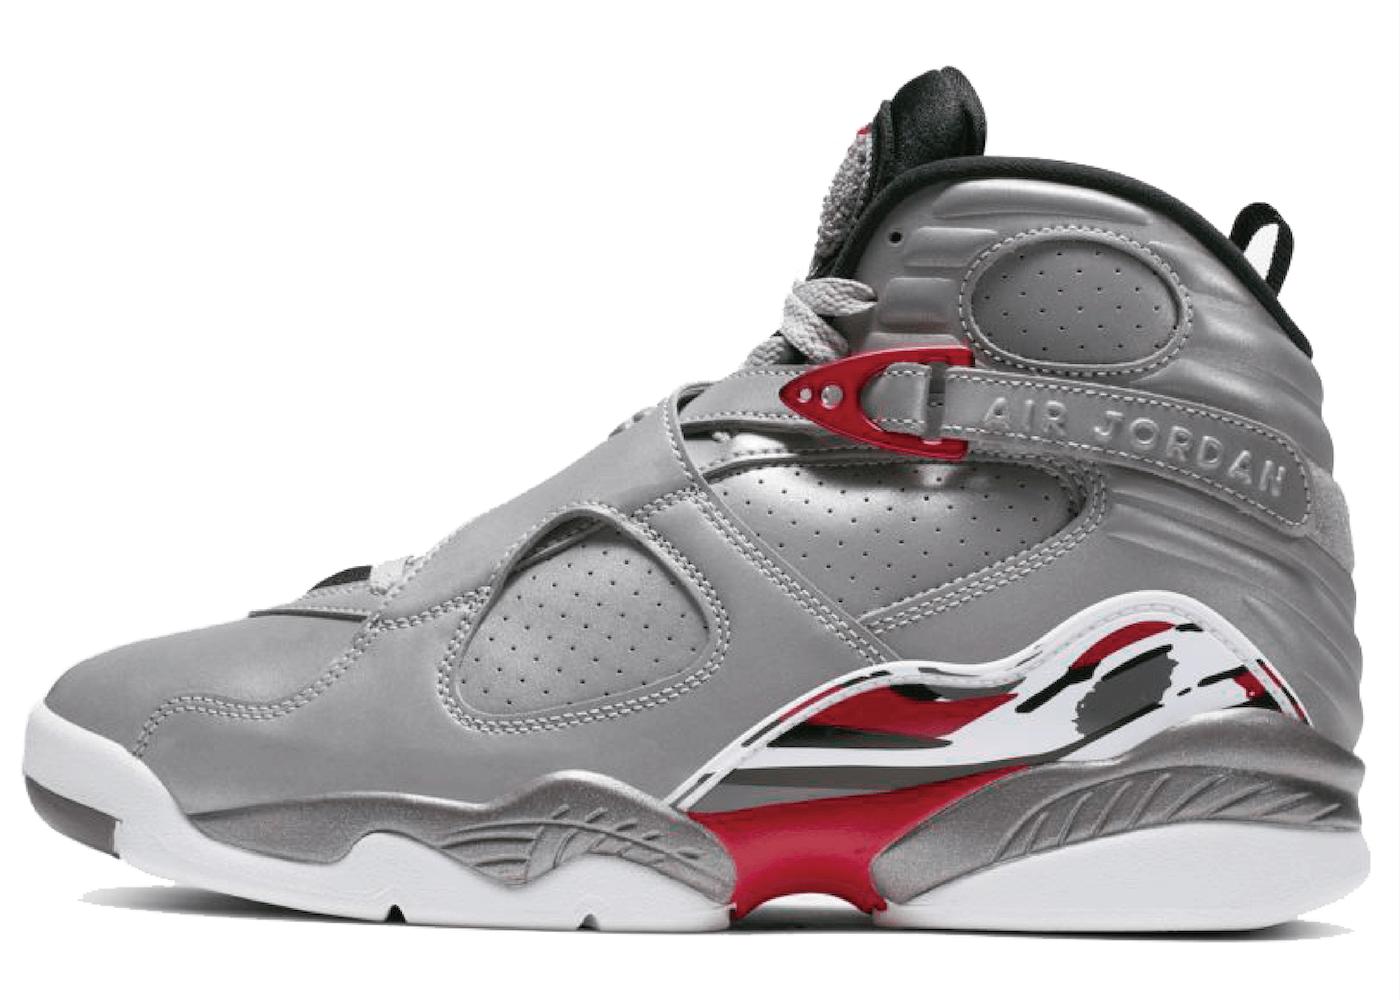 Nike Air Jordan 8 Retro Reflections of a Championの写真